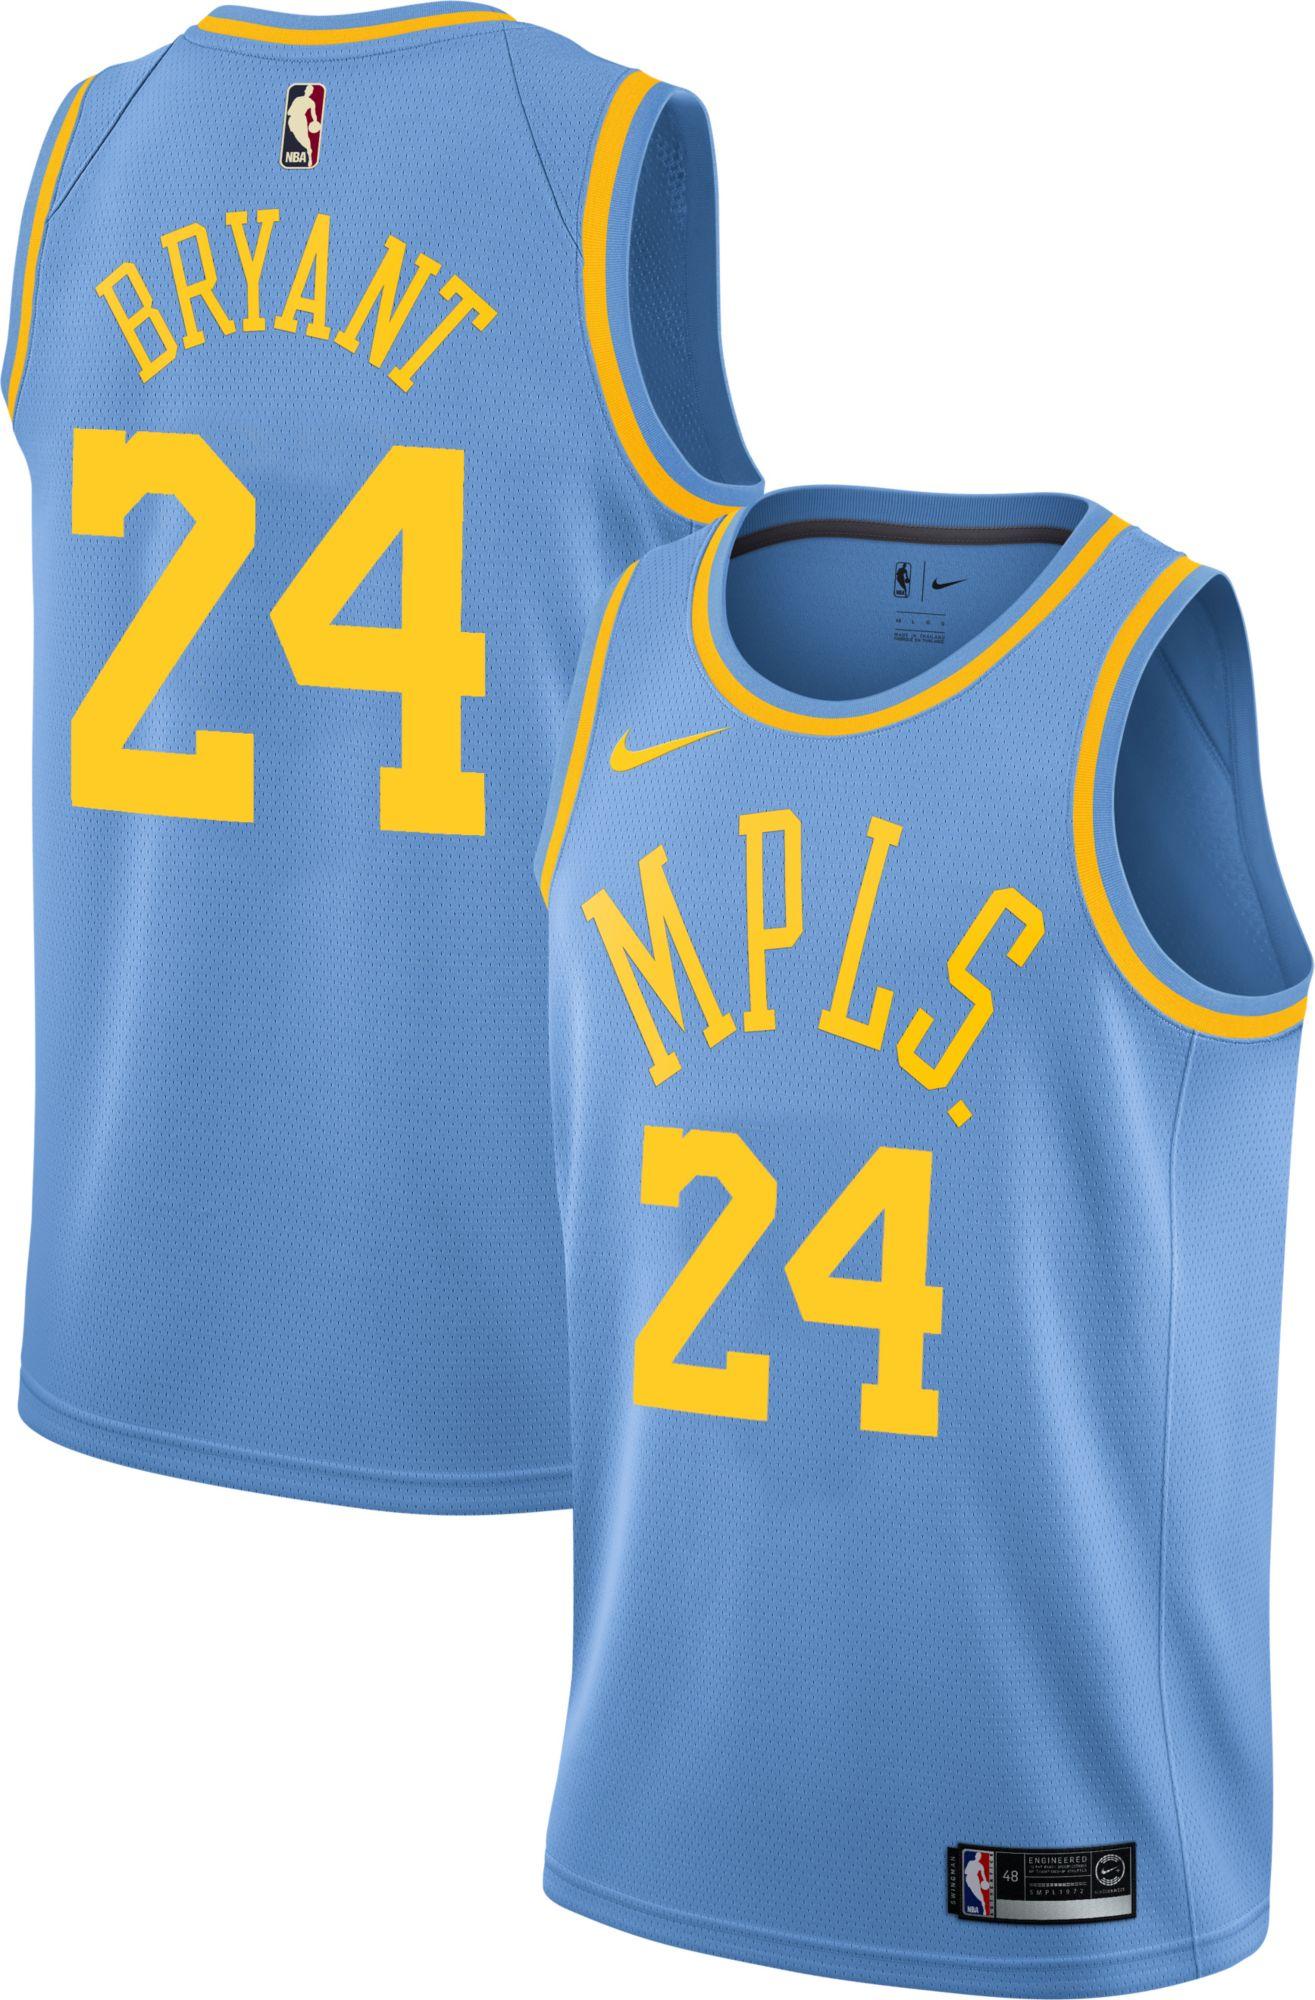 Nike Men s Los Angeles Lakers Kobe Bryant  24 Light Blue Dri-FIT ... 616a87779